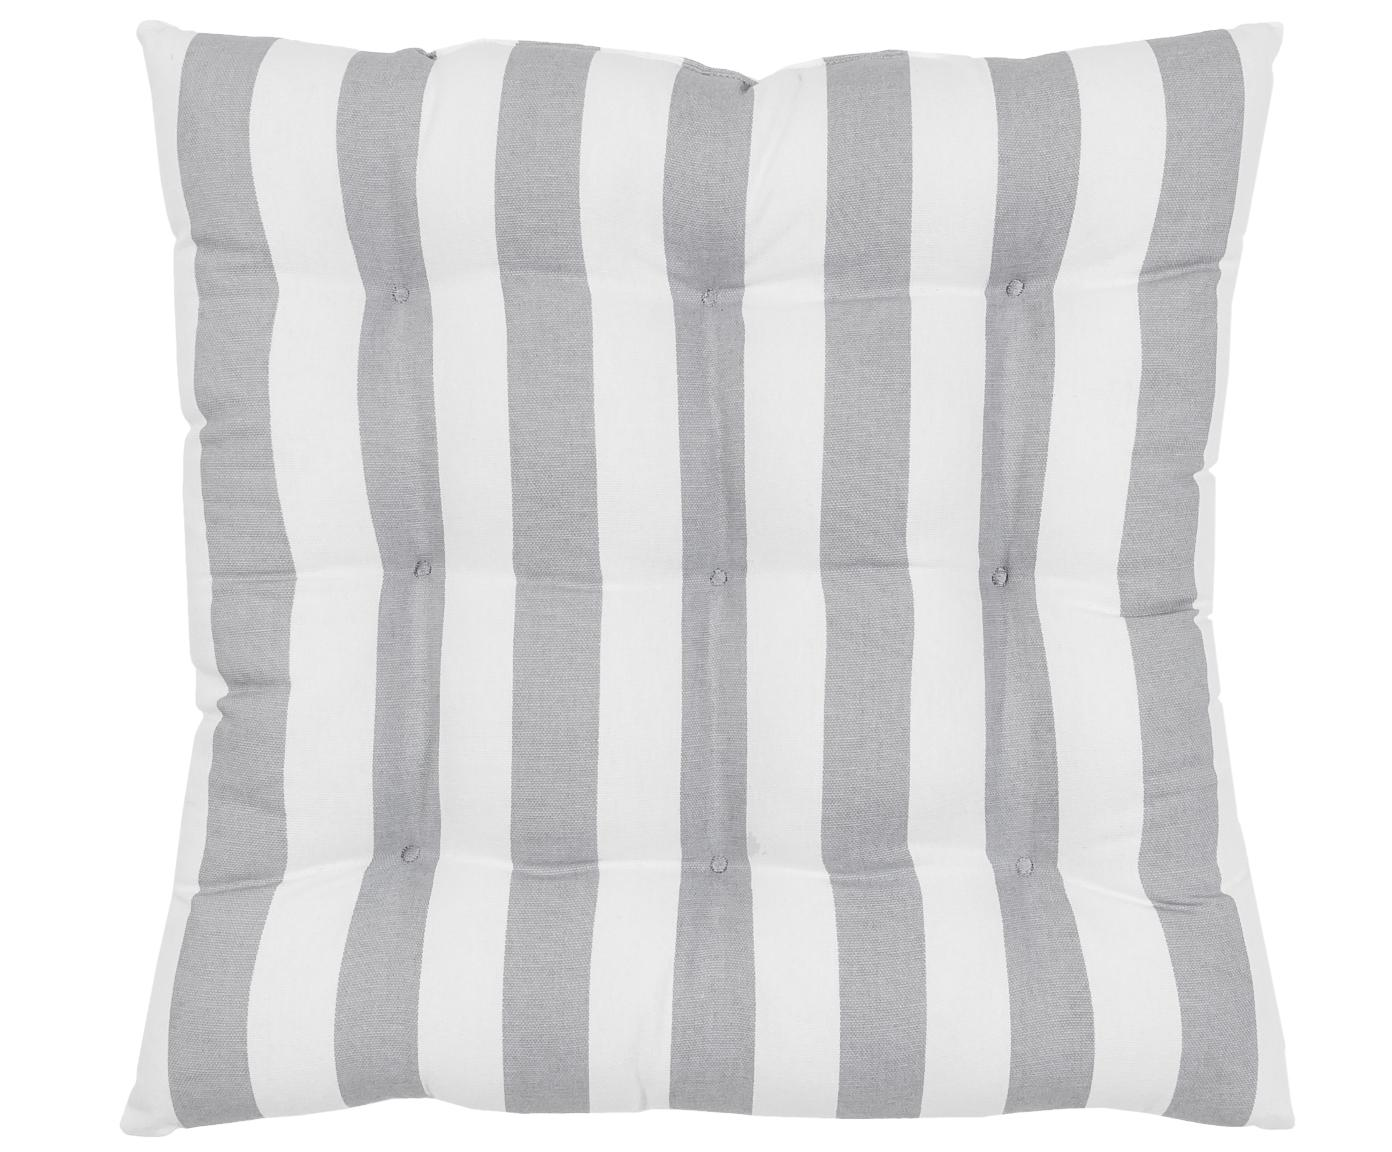 Stoelkussen Parasol, Lichtgrijs, wit, 40 x 40 cm